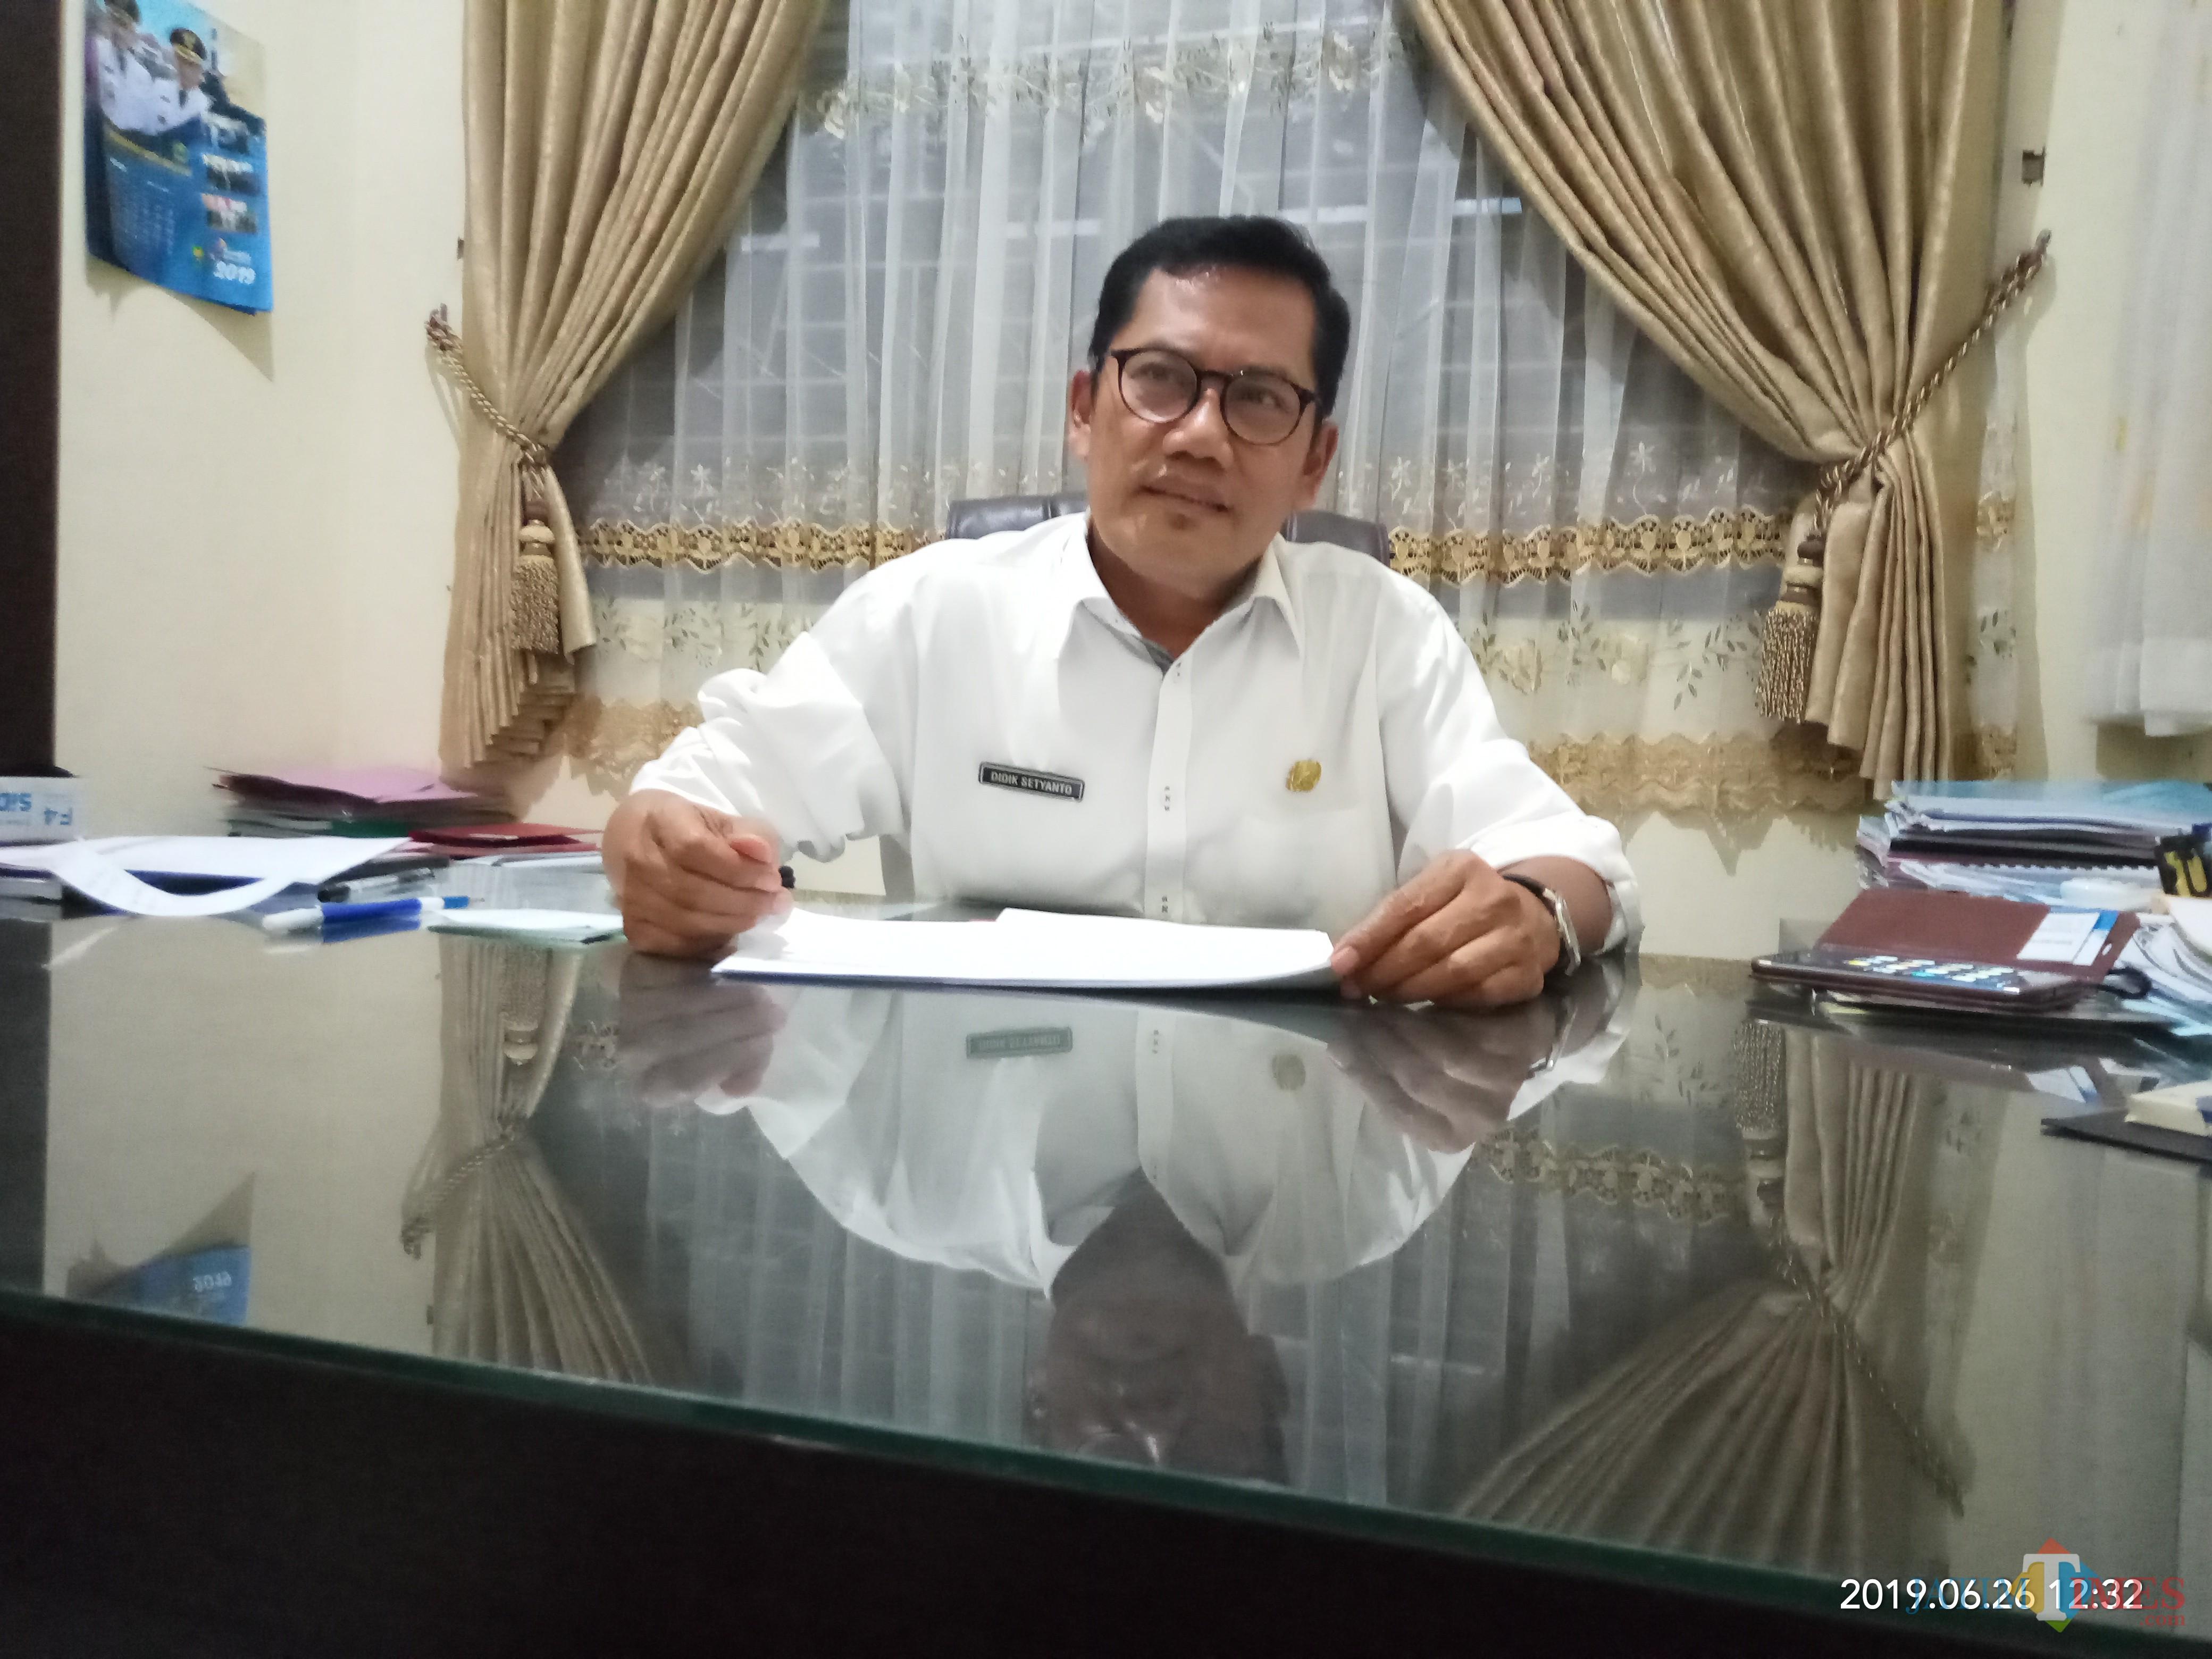 Kepala Bidang Bina Marga DPUPR Kota Malang, Didik Setyanto (Anggara Sudiongko/MalangTIMES)